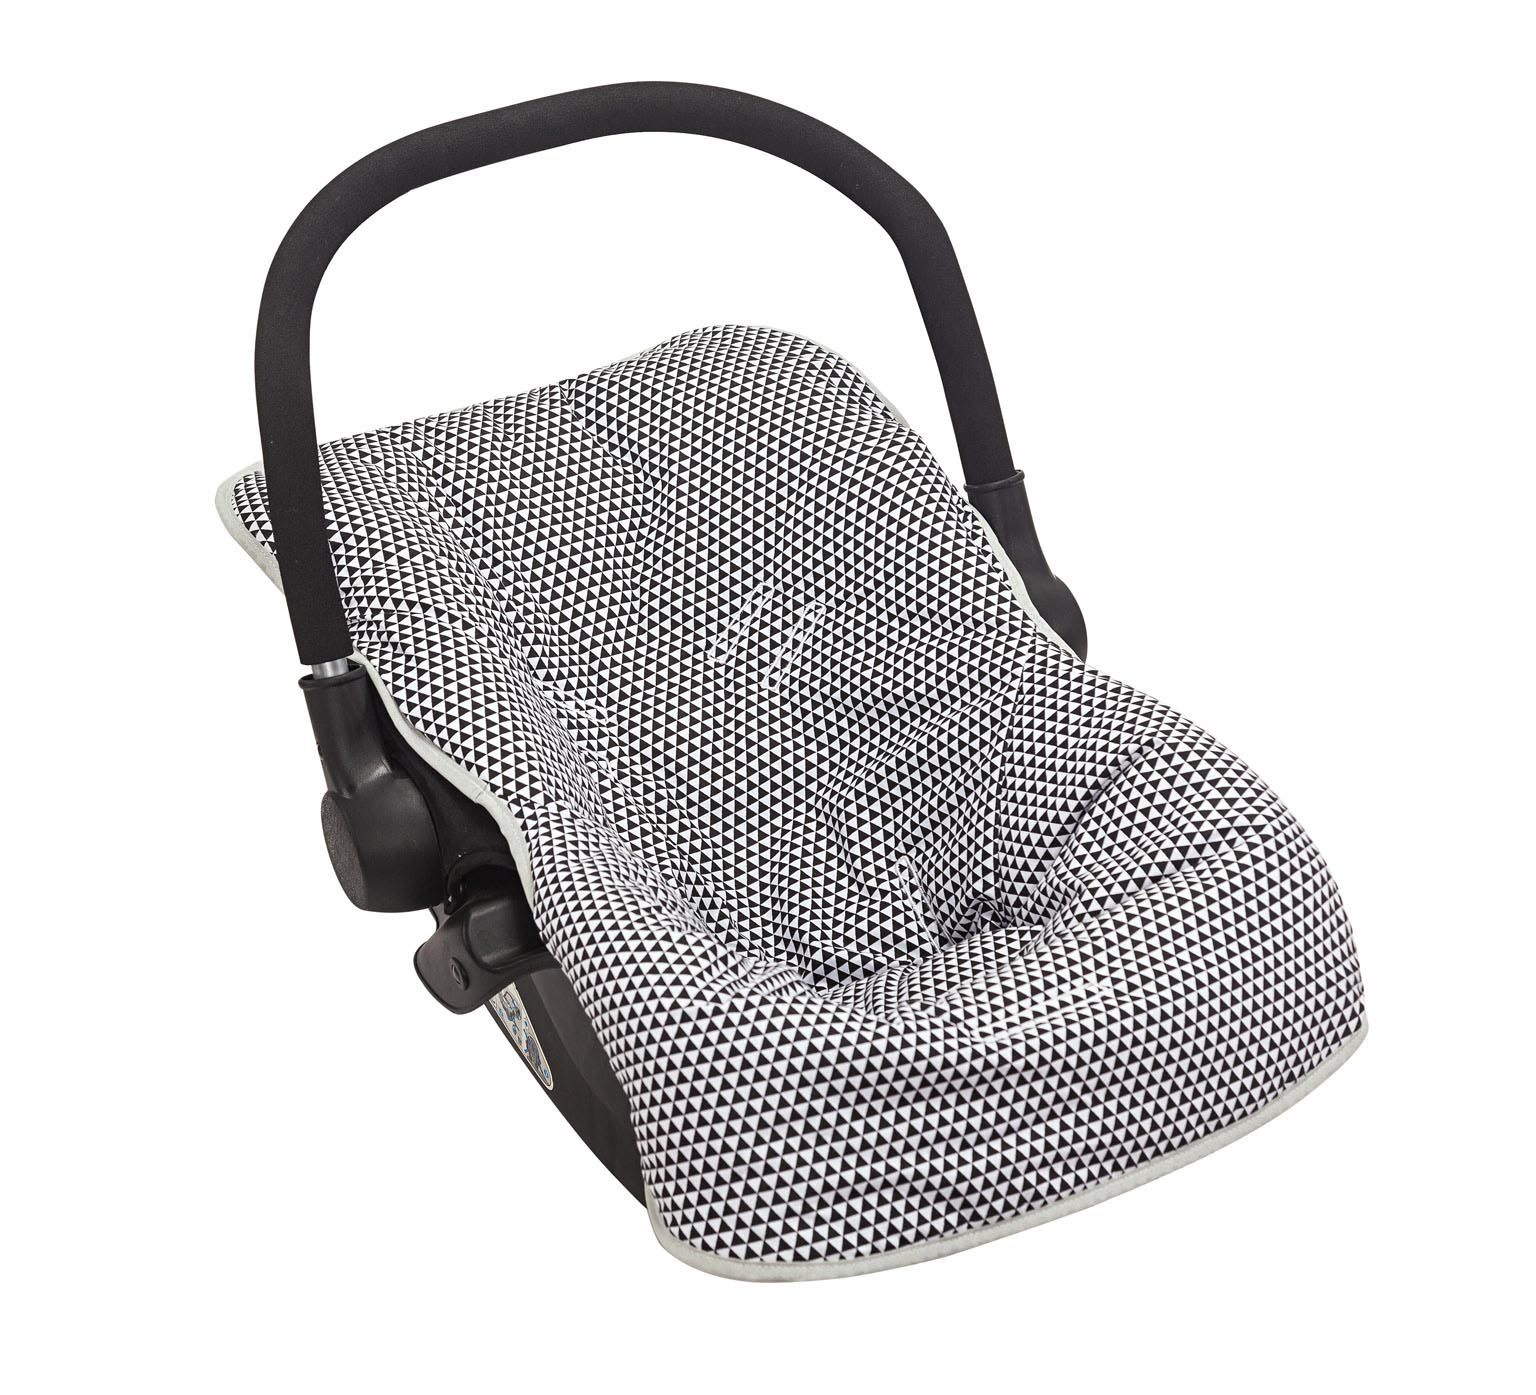 Capa para Bebê Conforto Triângulo Preto